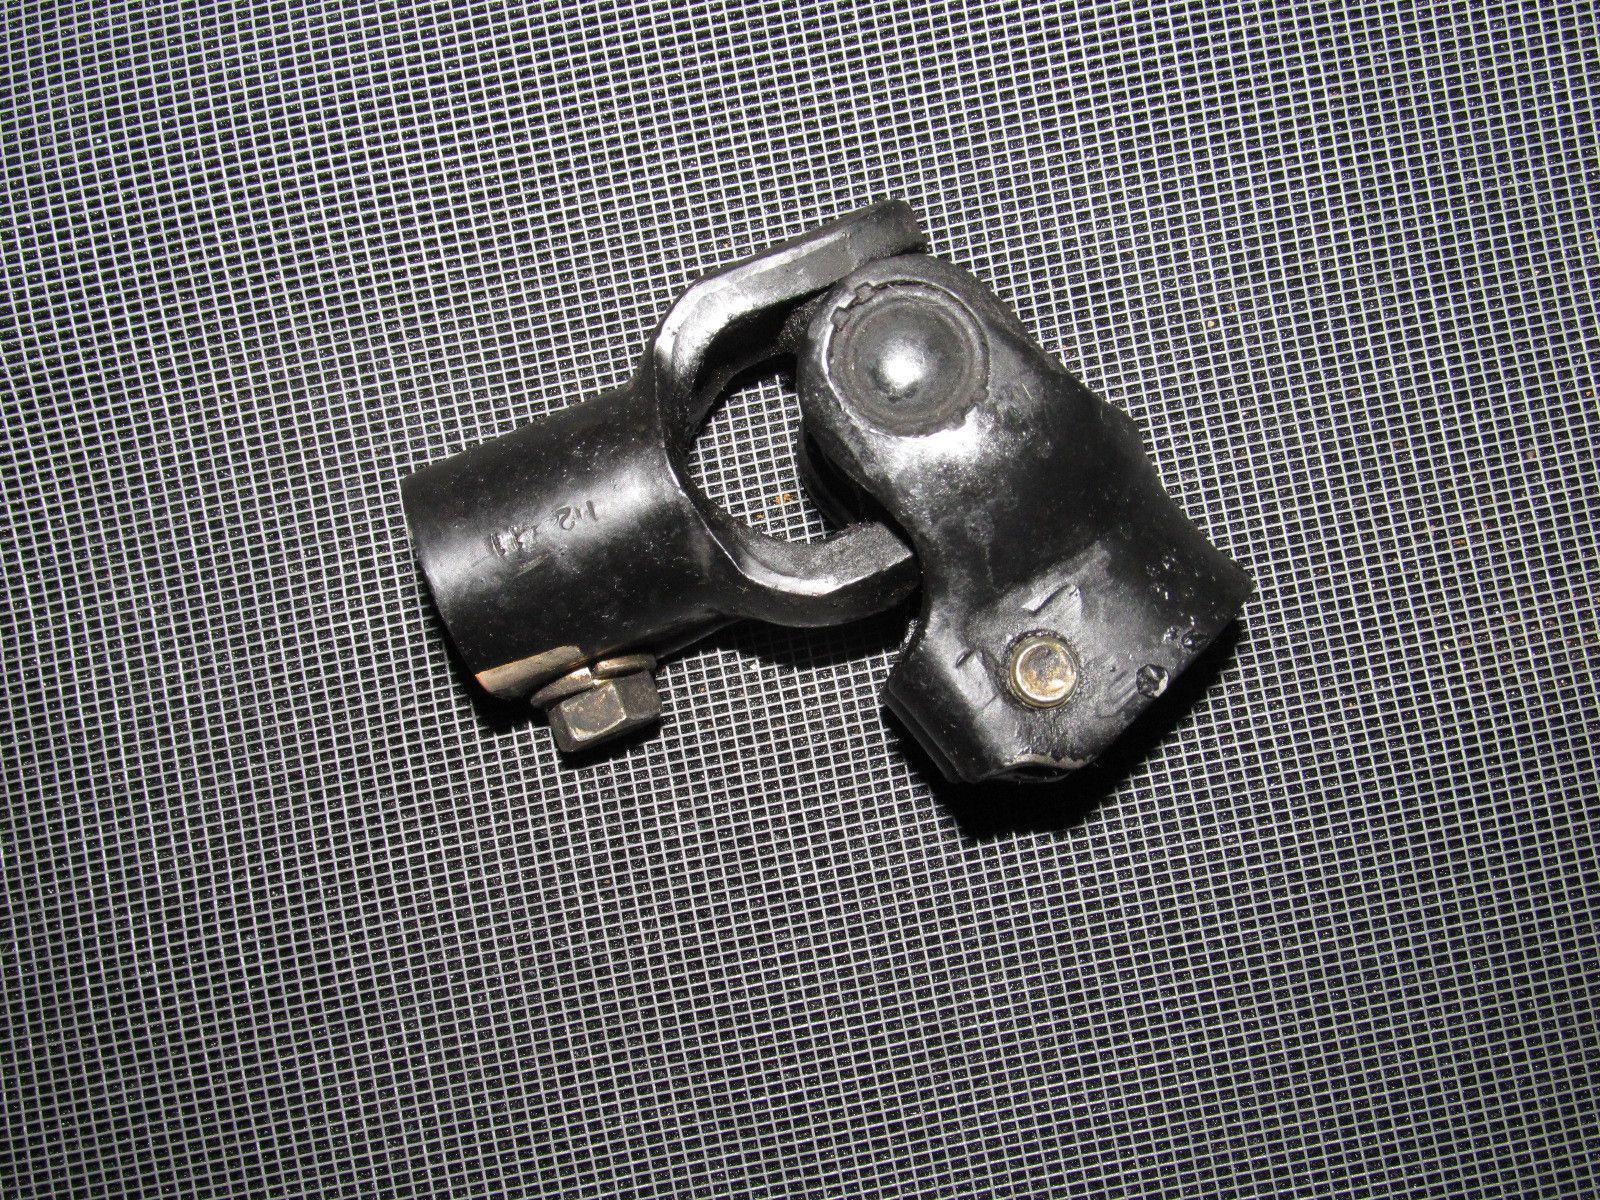 89 90 91 92 93 94 nissan 240sx oem steering column u joint coupler [ 1600 x 1200 Pixel ]